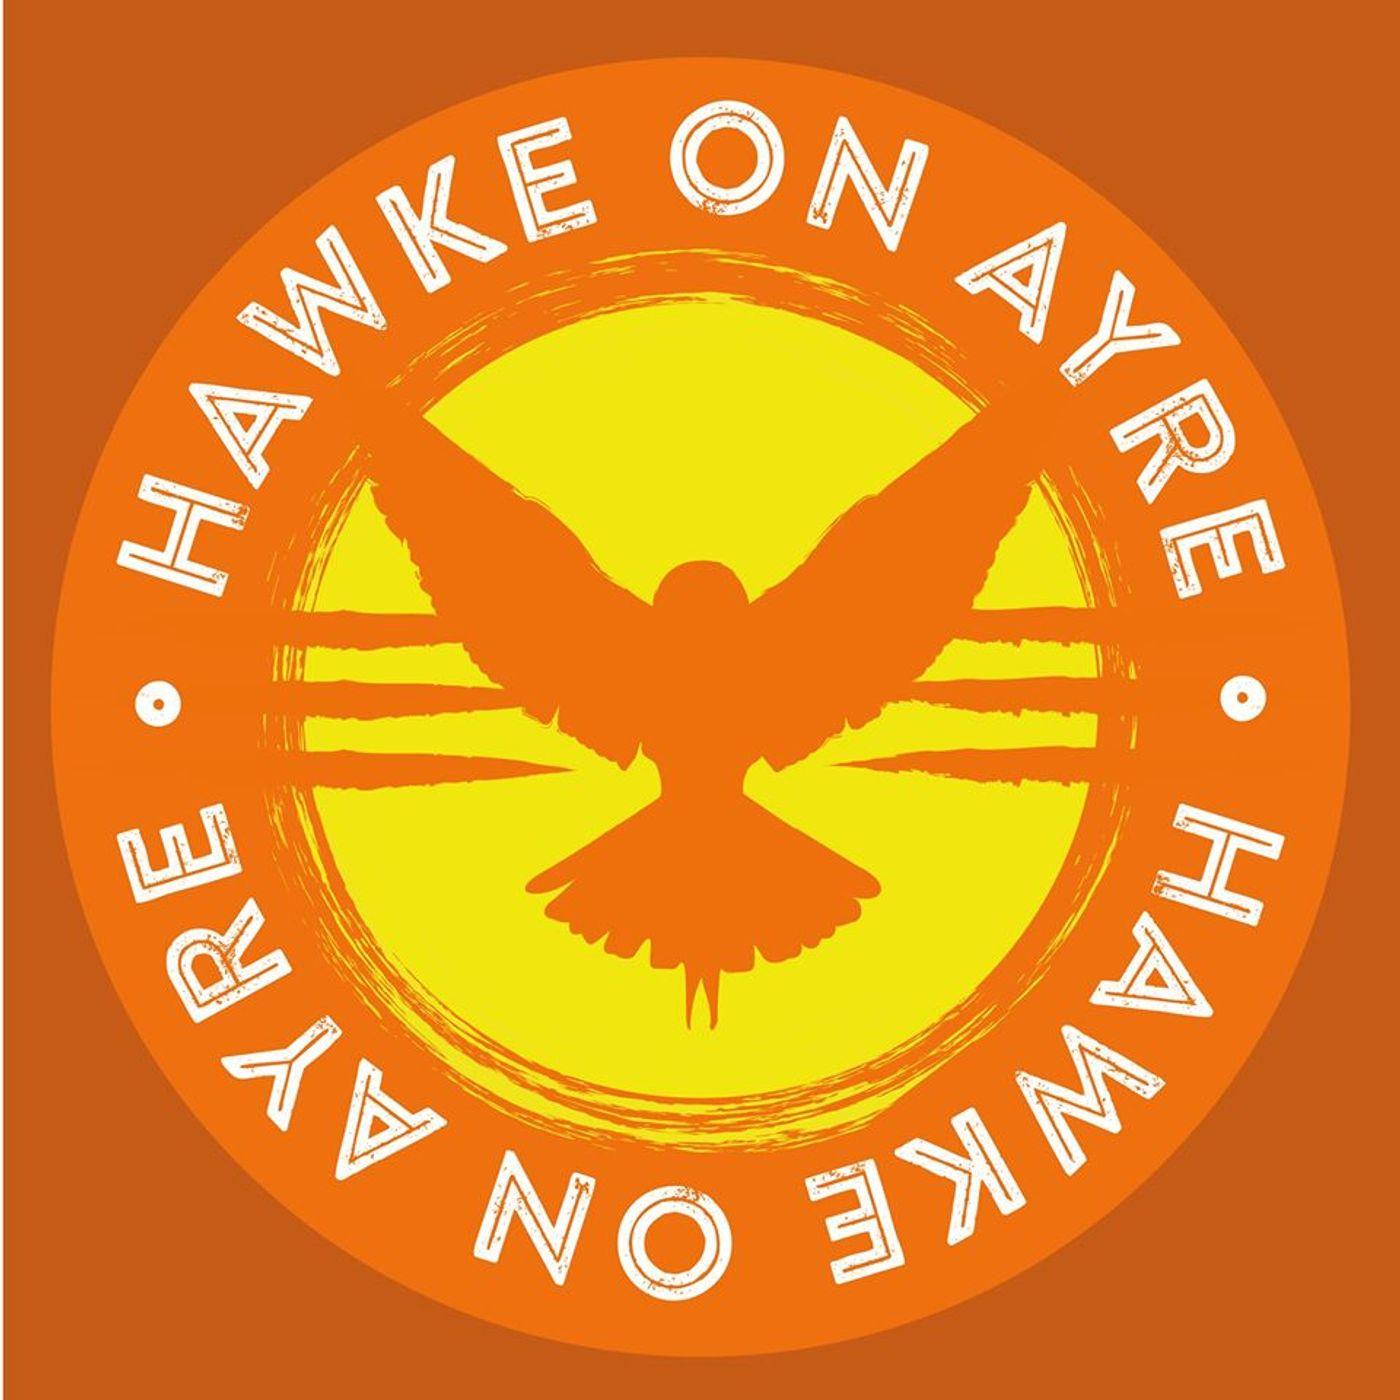 Hawke on Ayre